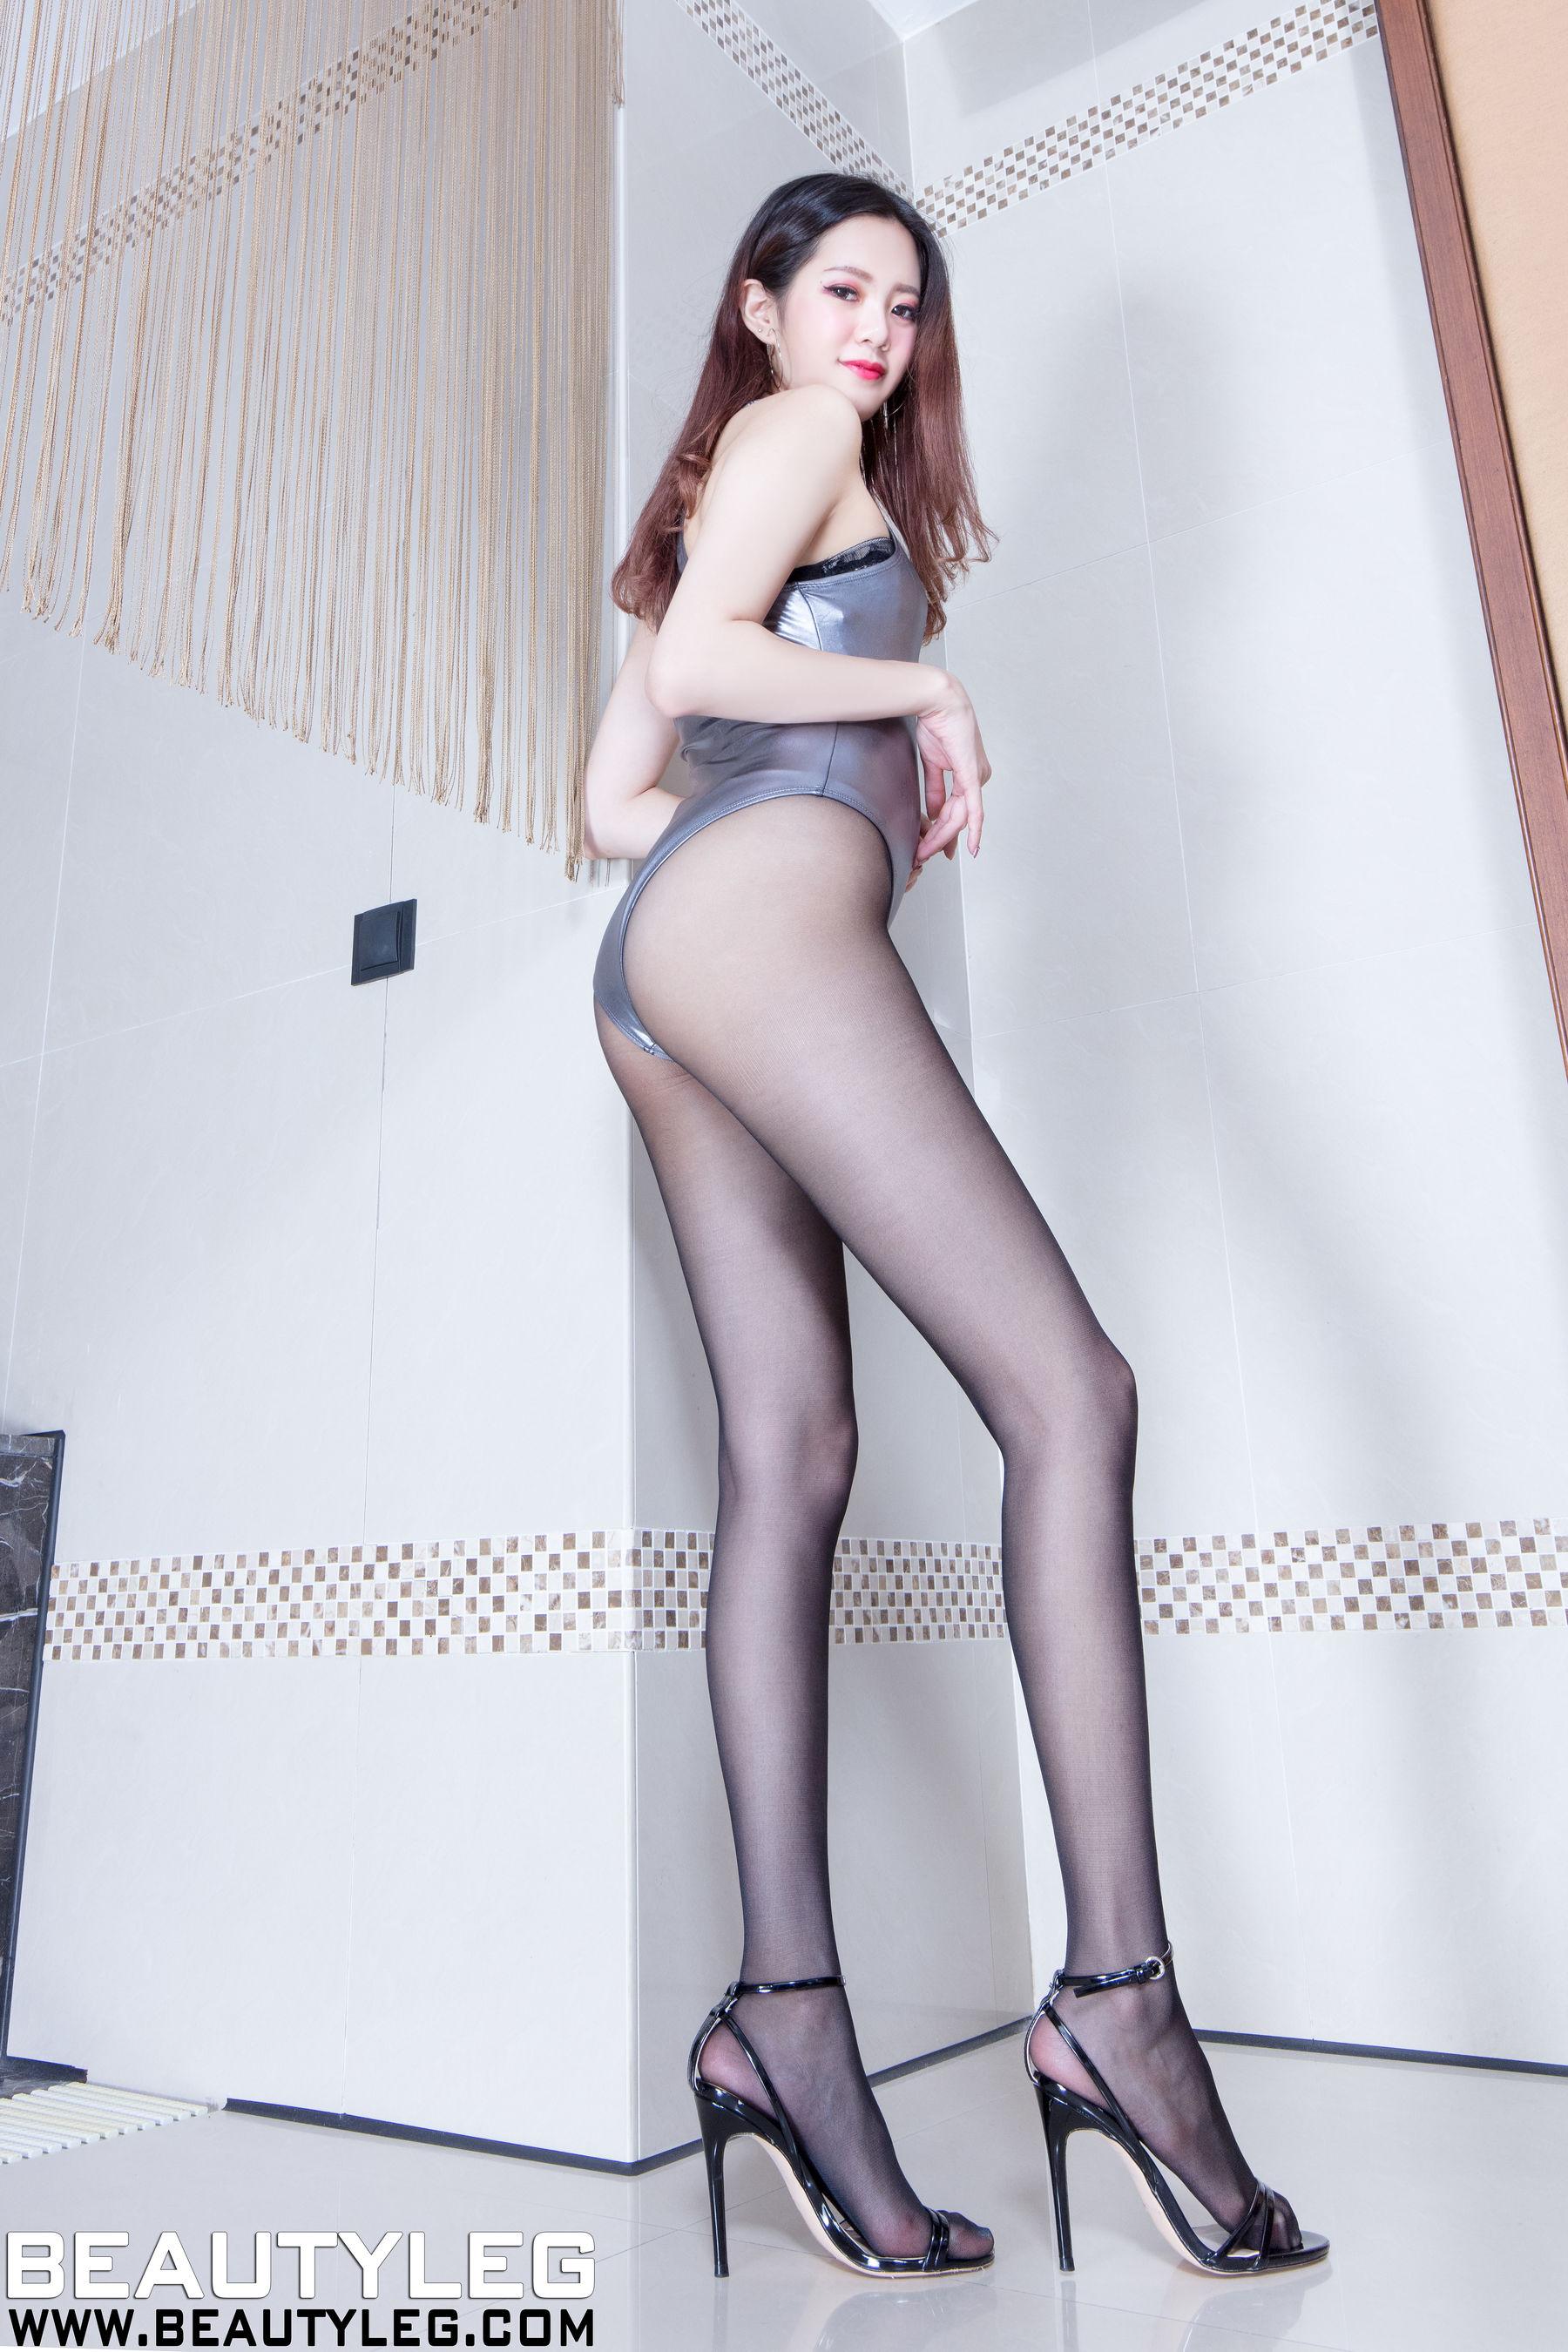 VOL.621 [Beautyleg]高跟美腿:腿模Una(Beautyleg Una)超高清个人性感漂亮大图(50P)